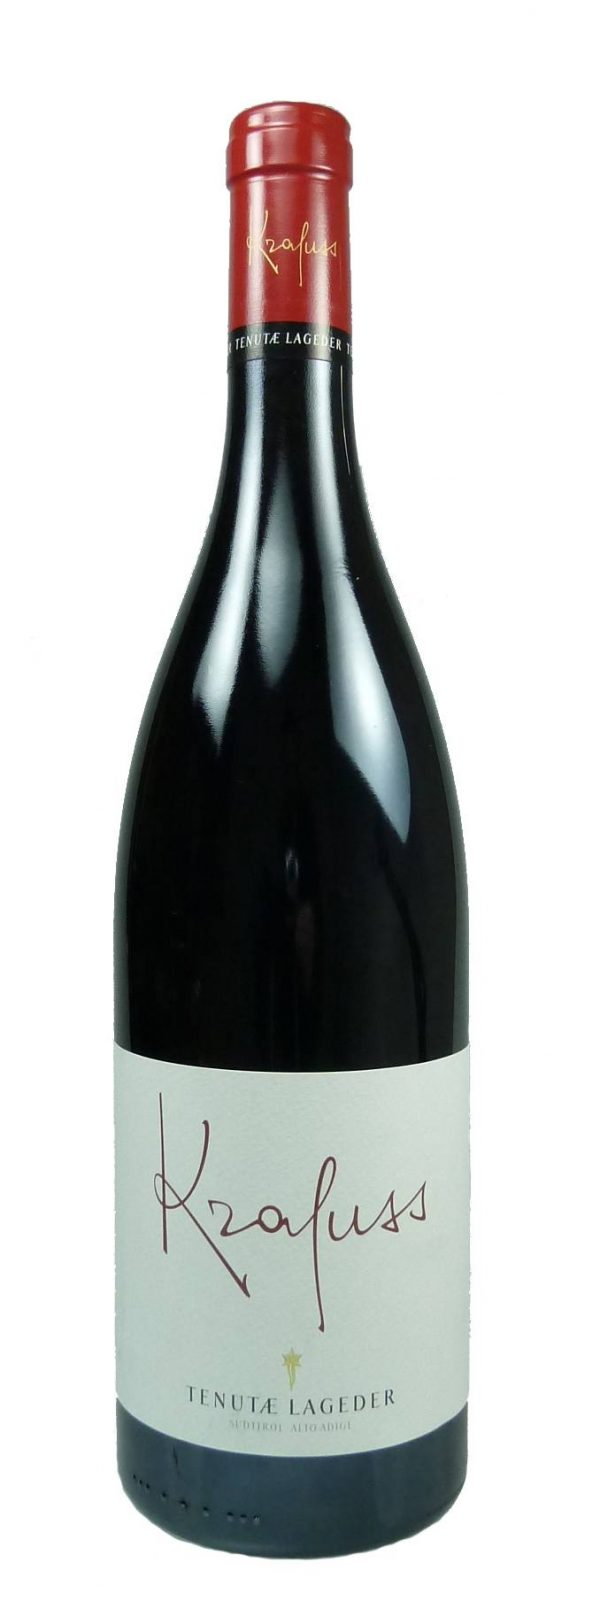 Krafuss Pinot Noir Tenutae Lageder 2013